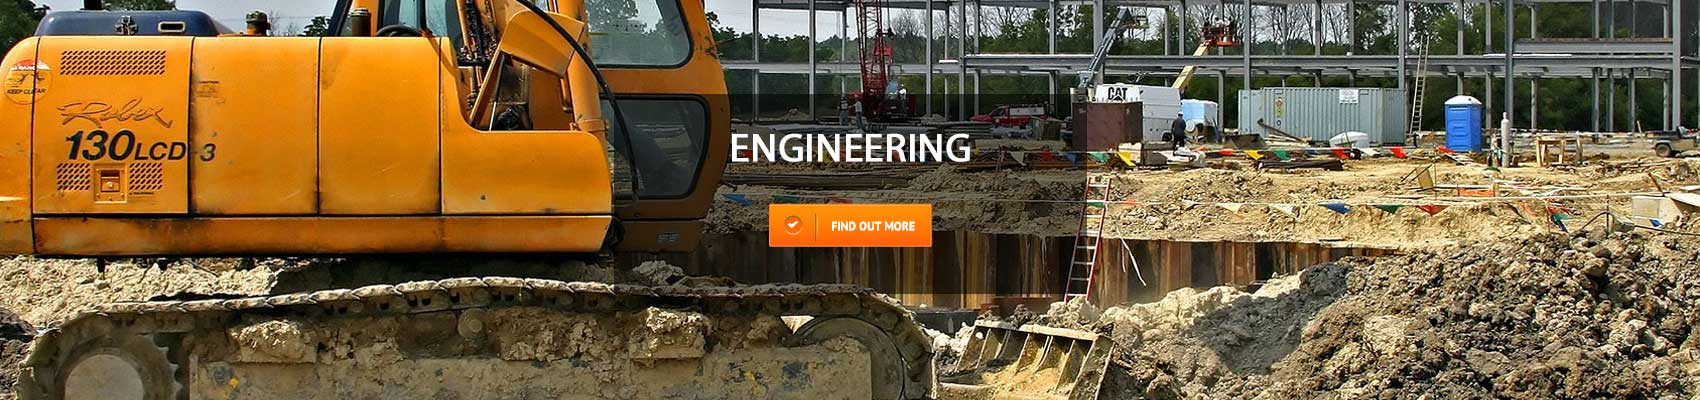 slides-engineeringconstruction